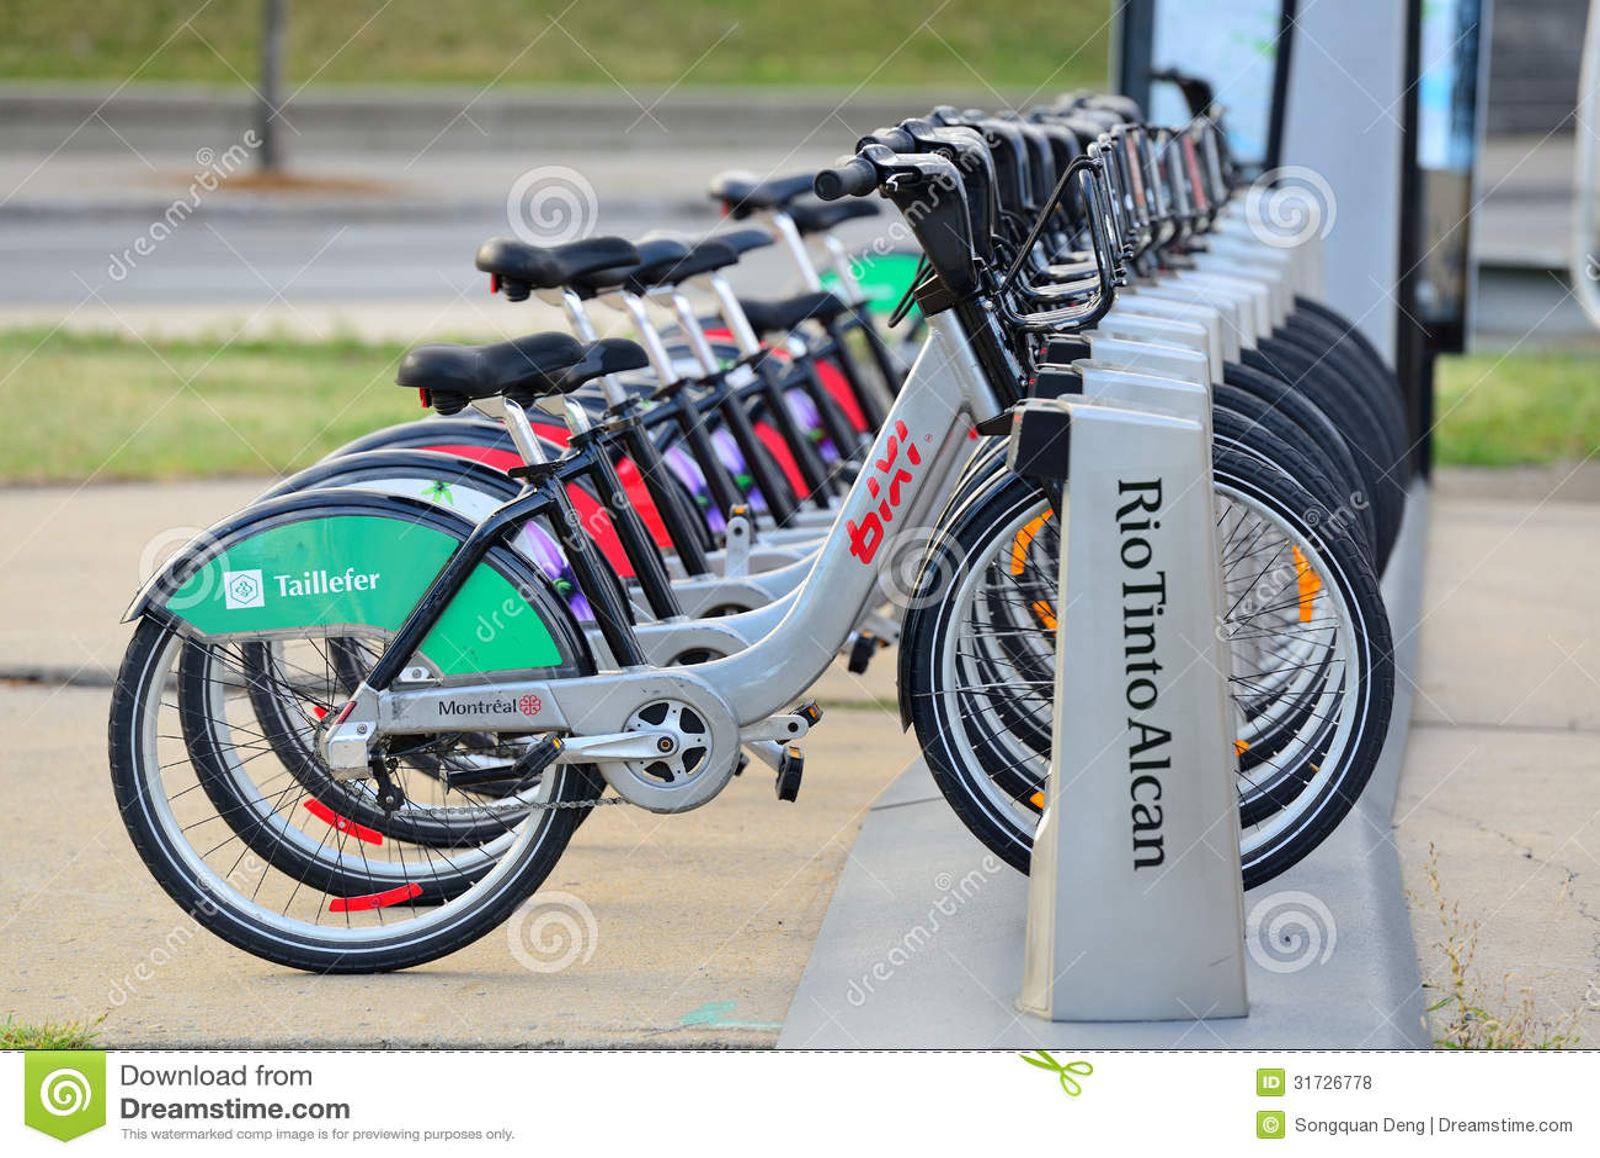 Montreal-Fahrradmiete